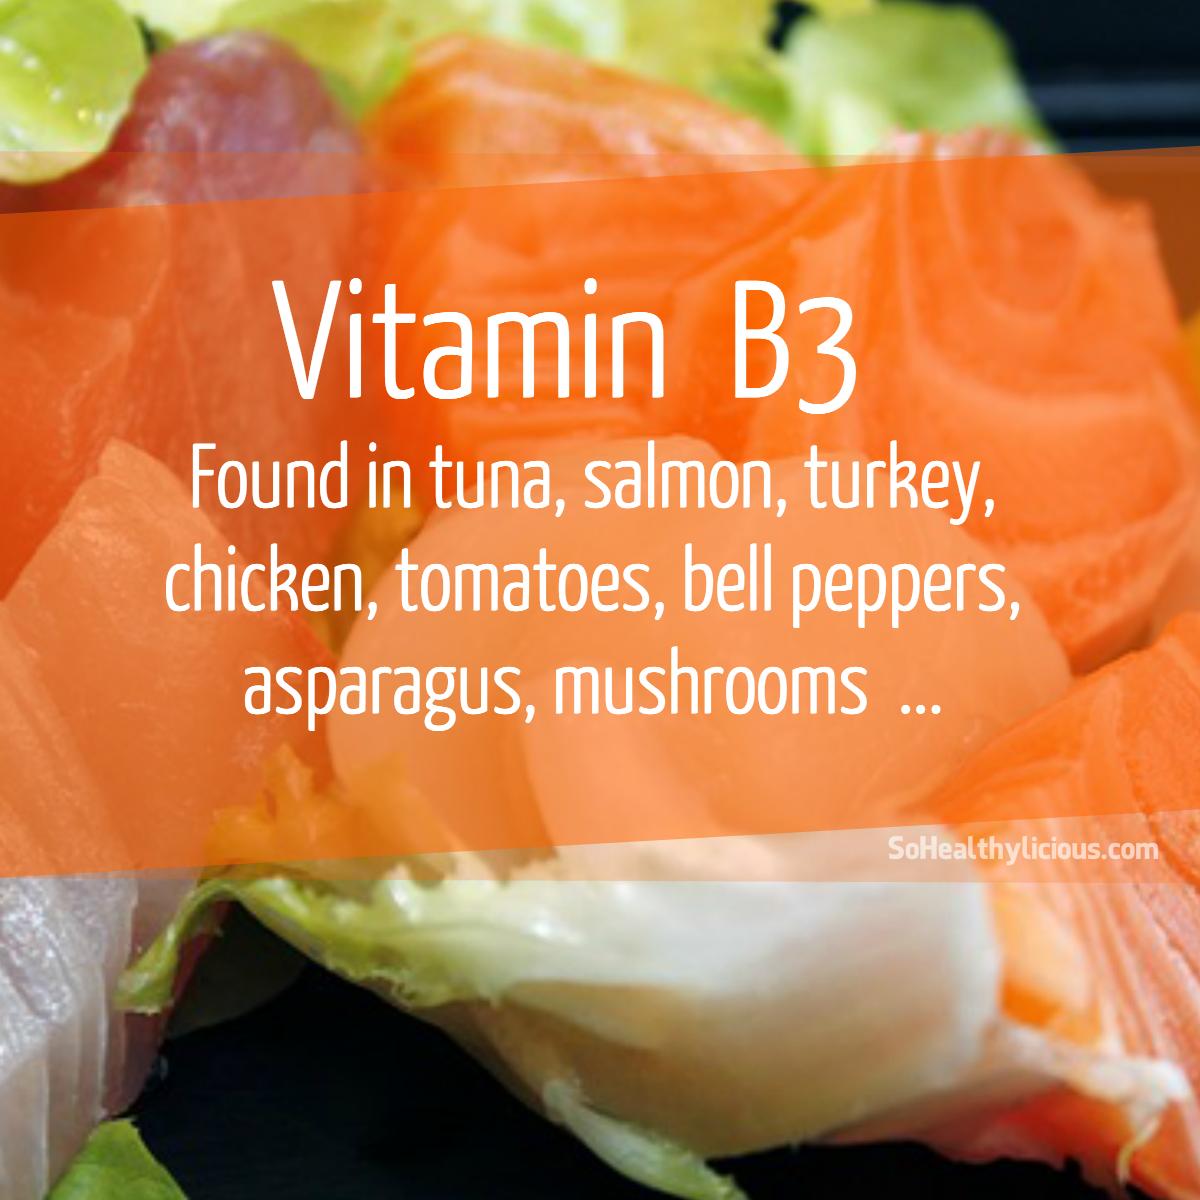 Benefits of Vitamin B3